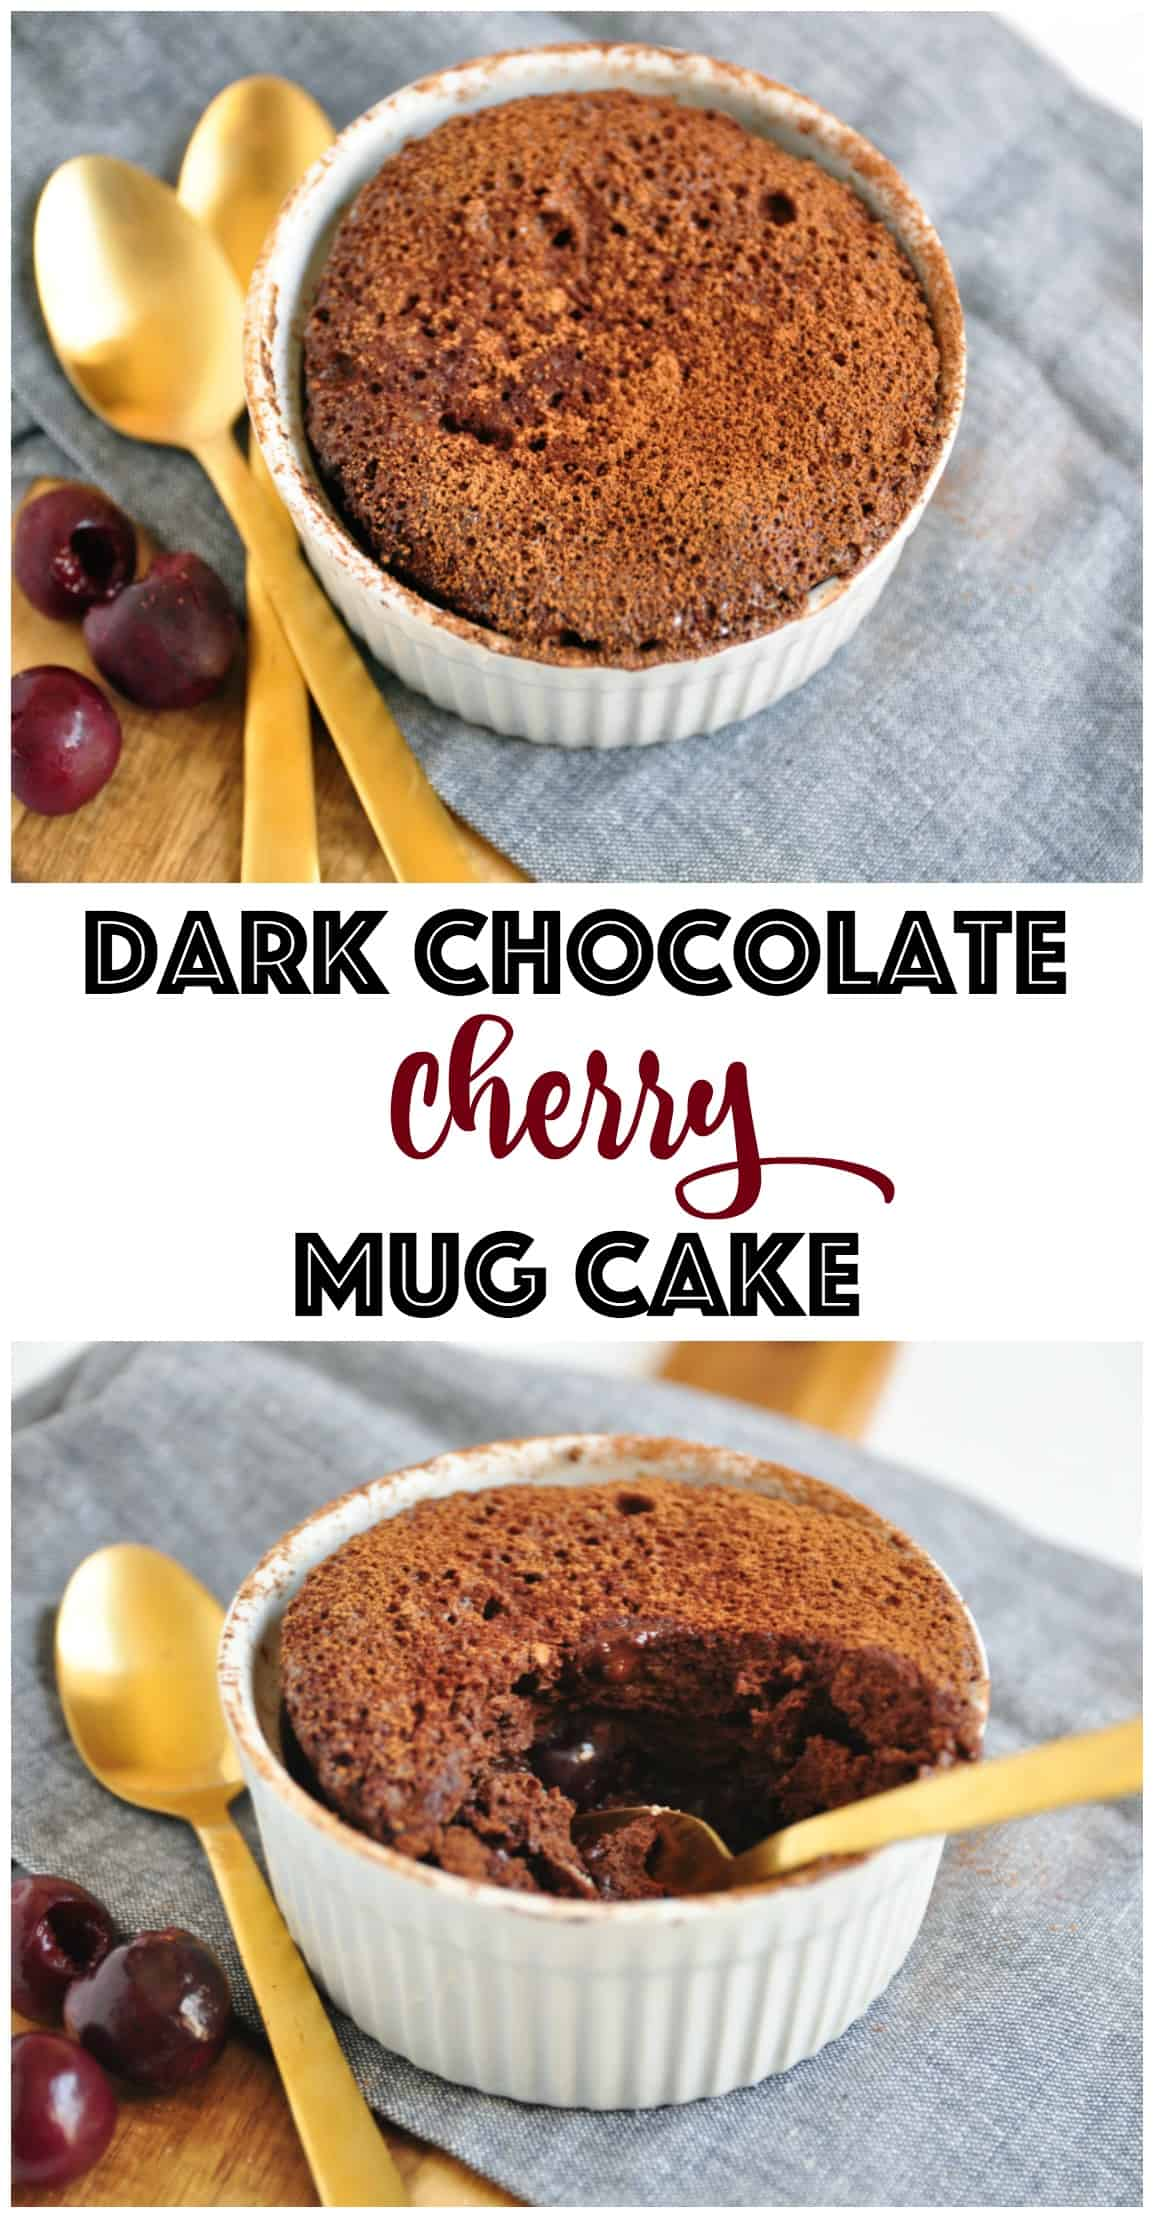 Dark Chocolate Cherry Mug Cake. Be Whole. Be You.